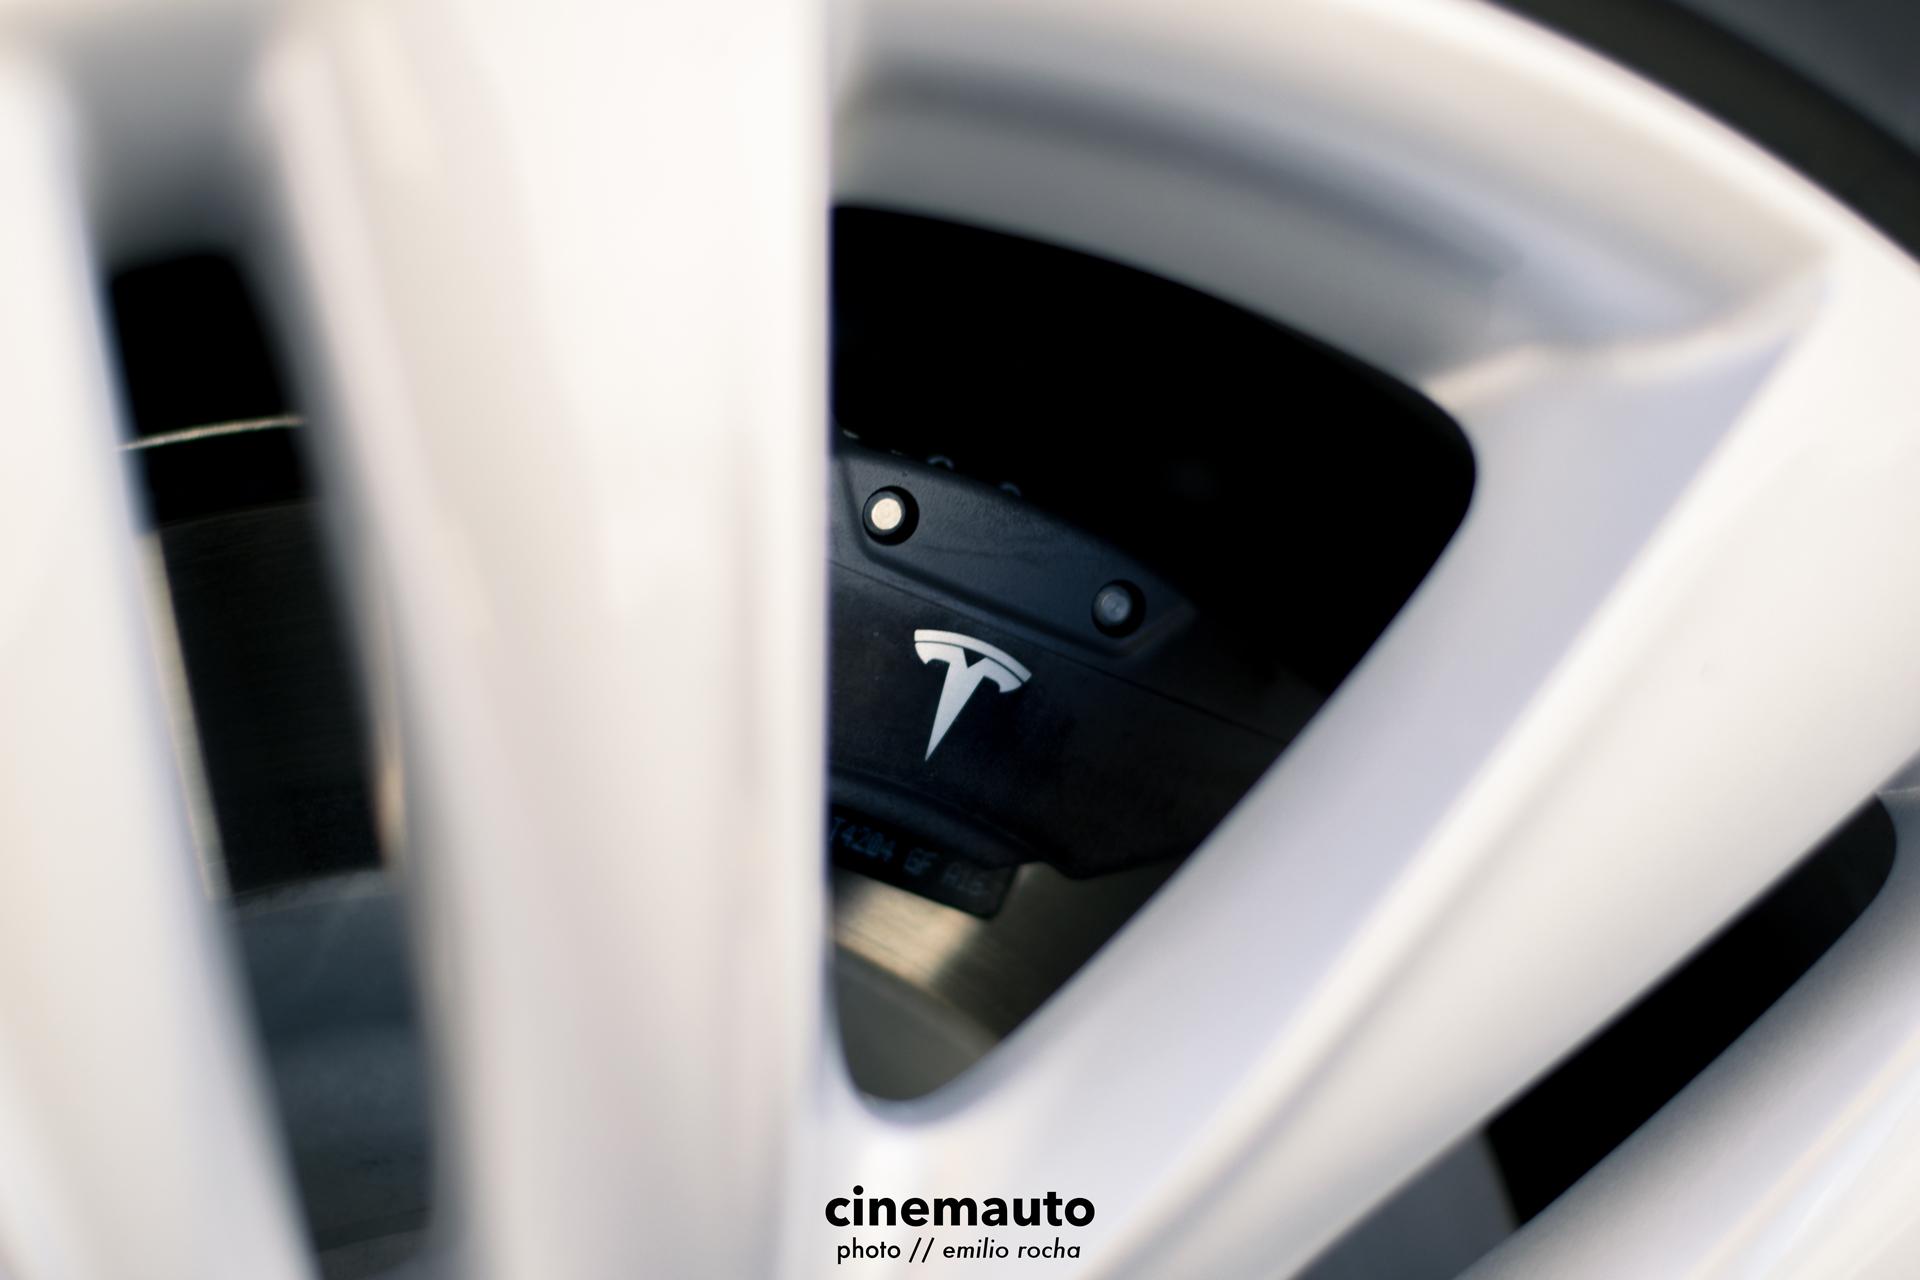 TeslaCinemauto-20.jpg